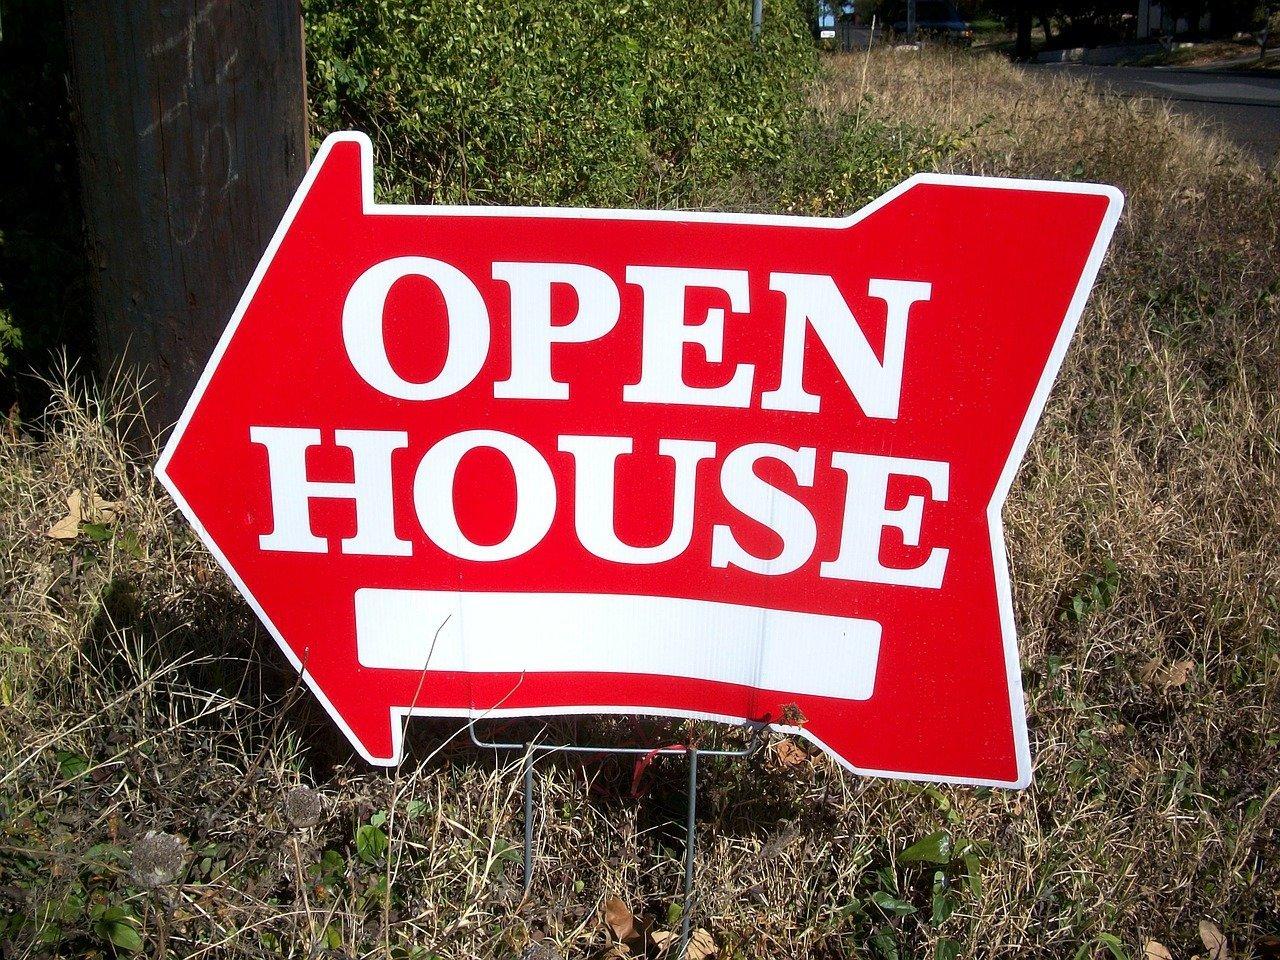 open-house-778_1280